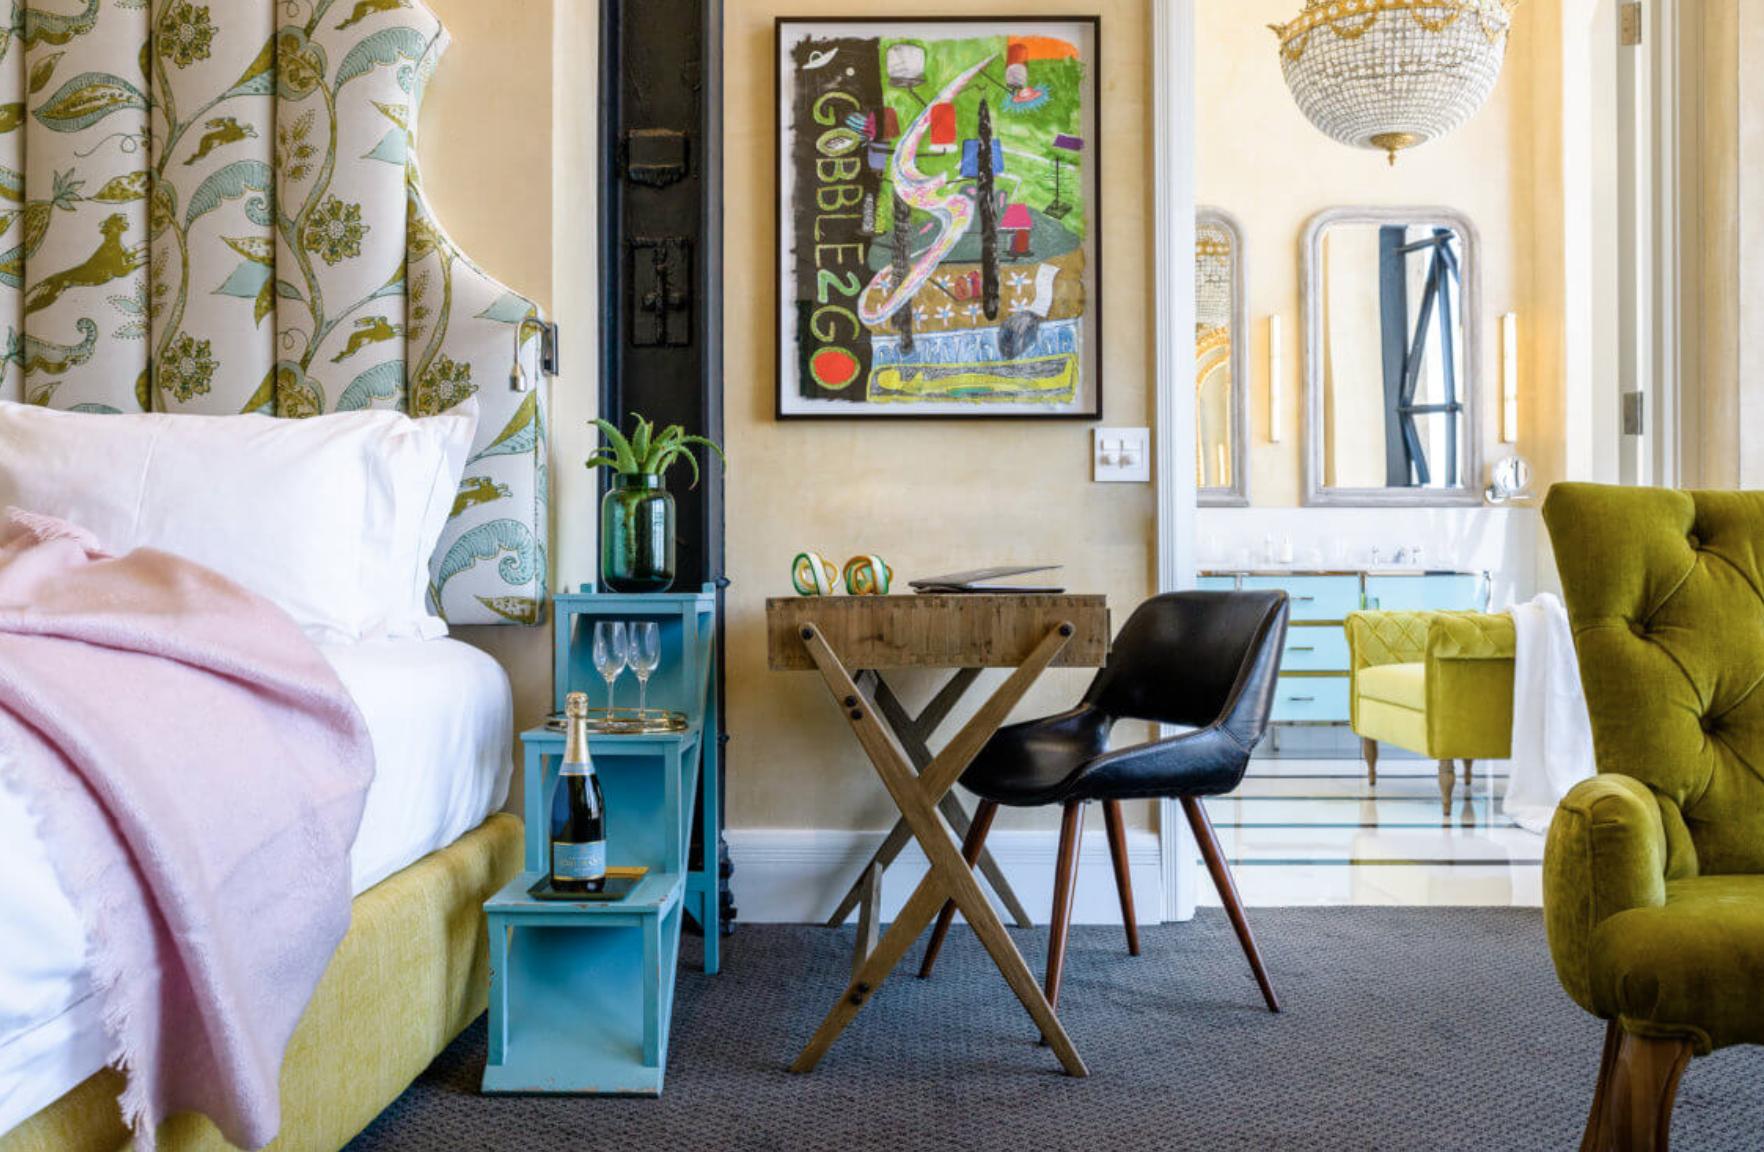 Quirky Room in Silo Hotel